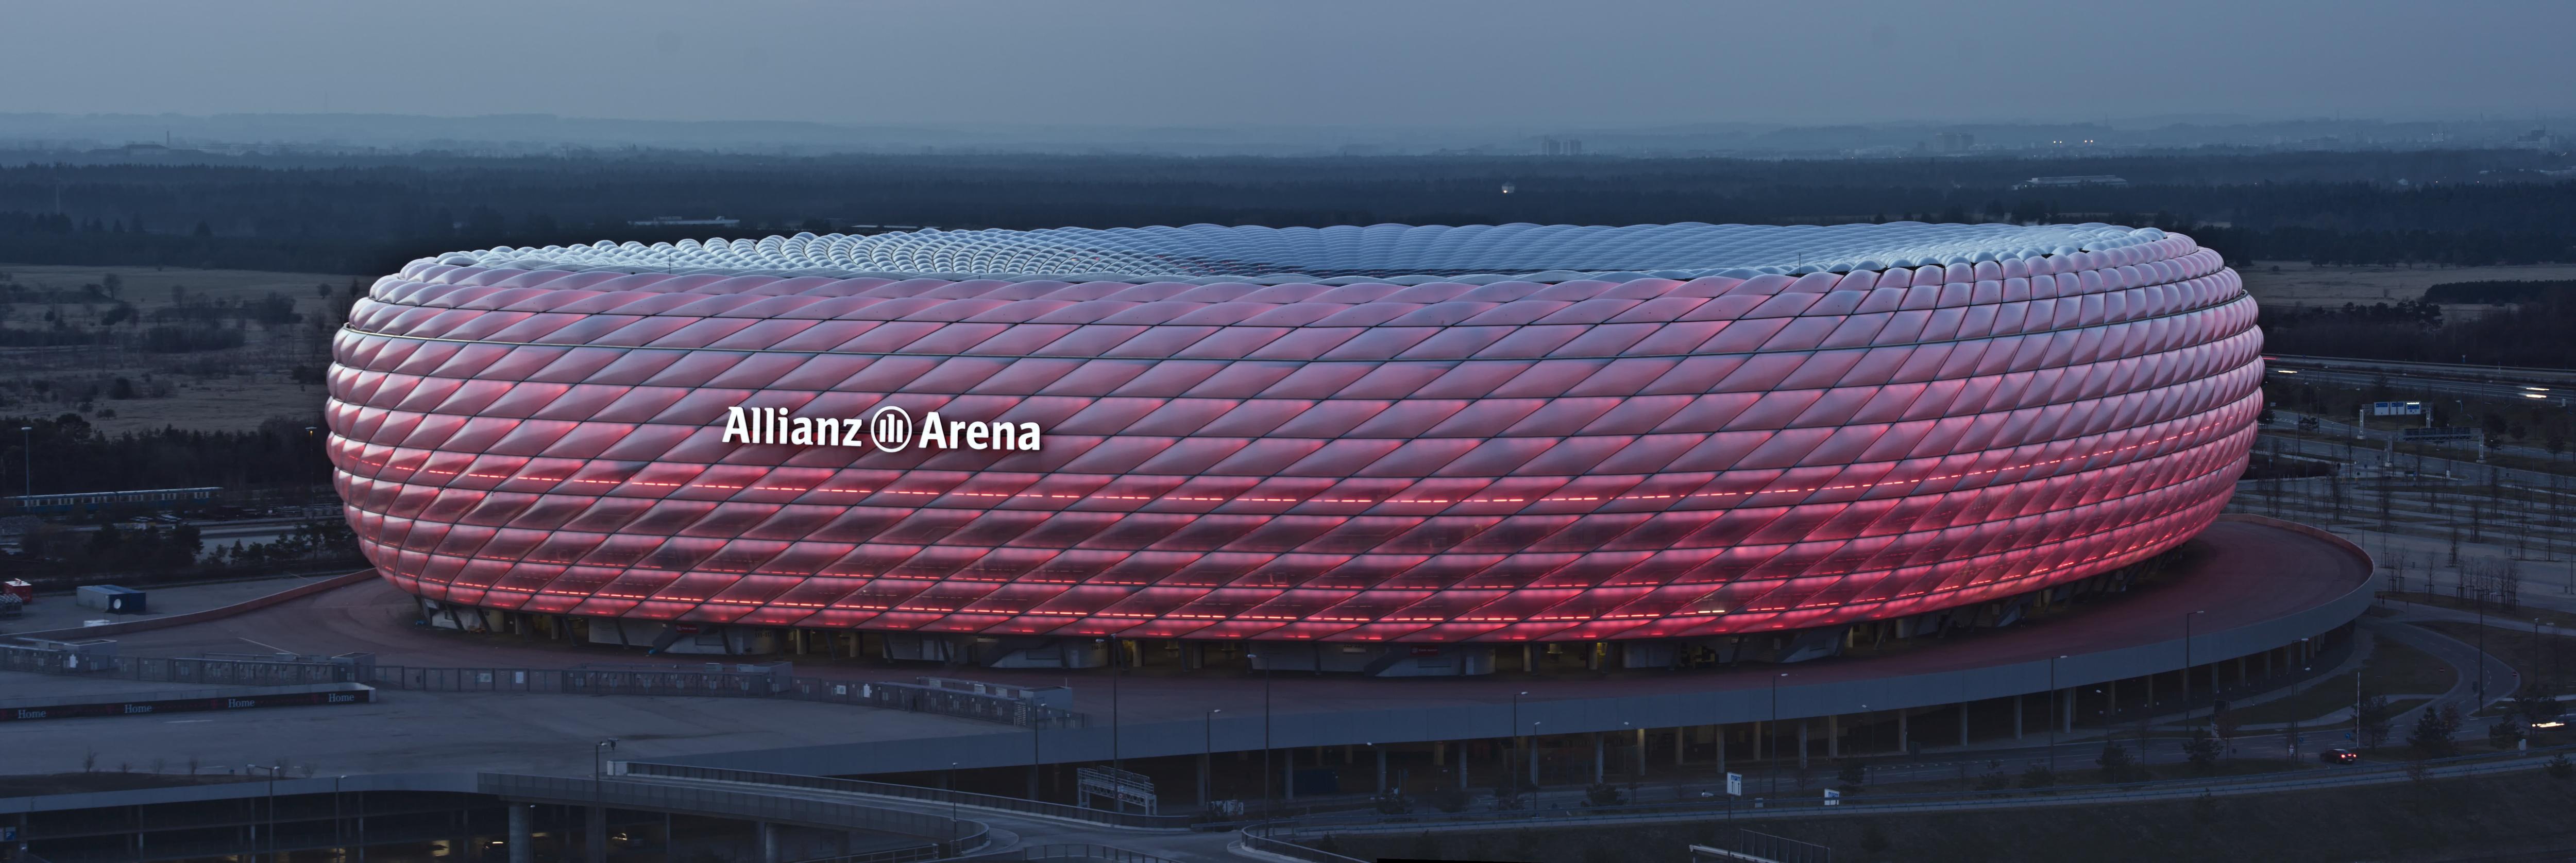 https://upload.wikimedia.org/wikipedia/commons/d/da/Allianz_arena_golden_hour_Richard_Bartz.jpg